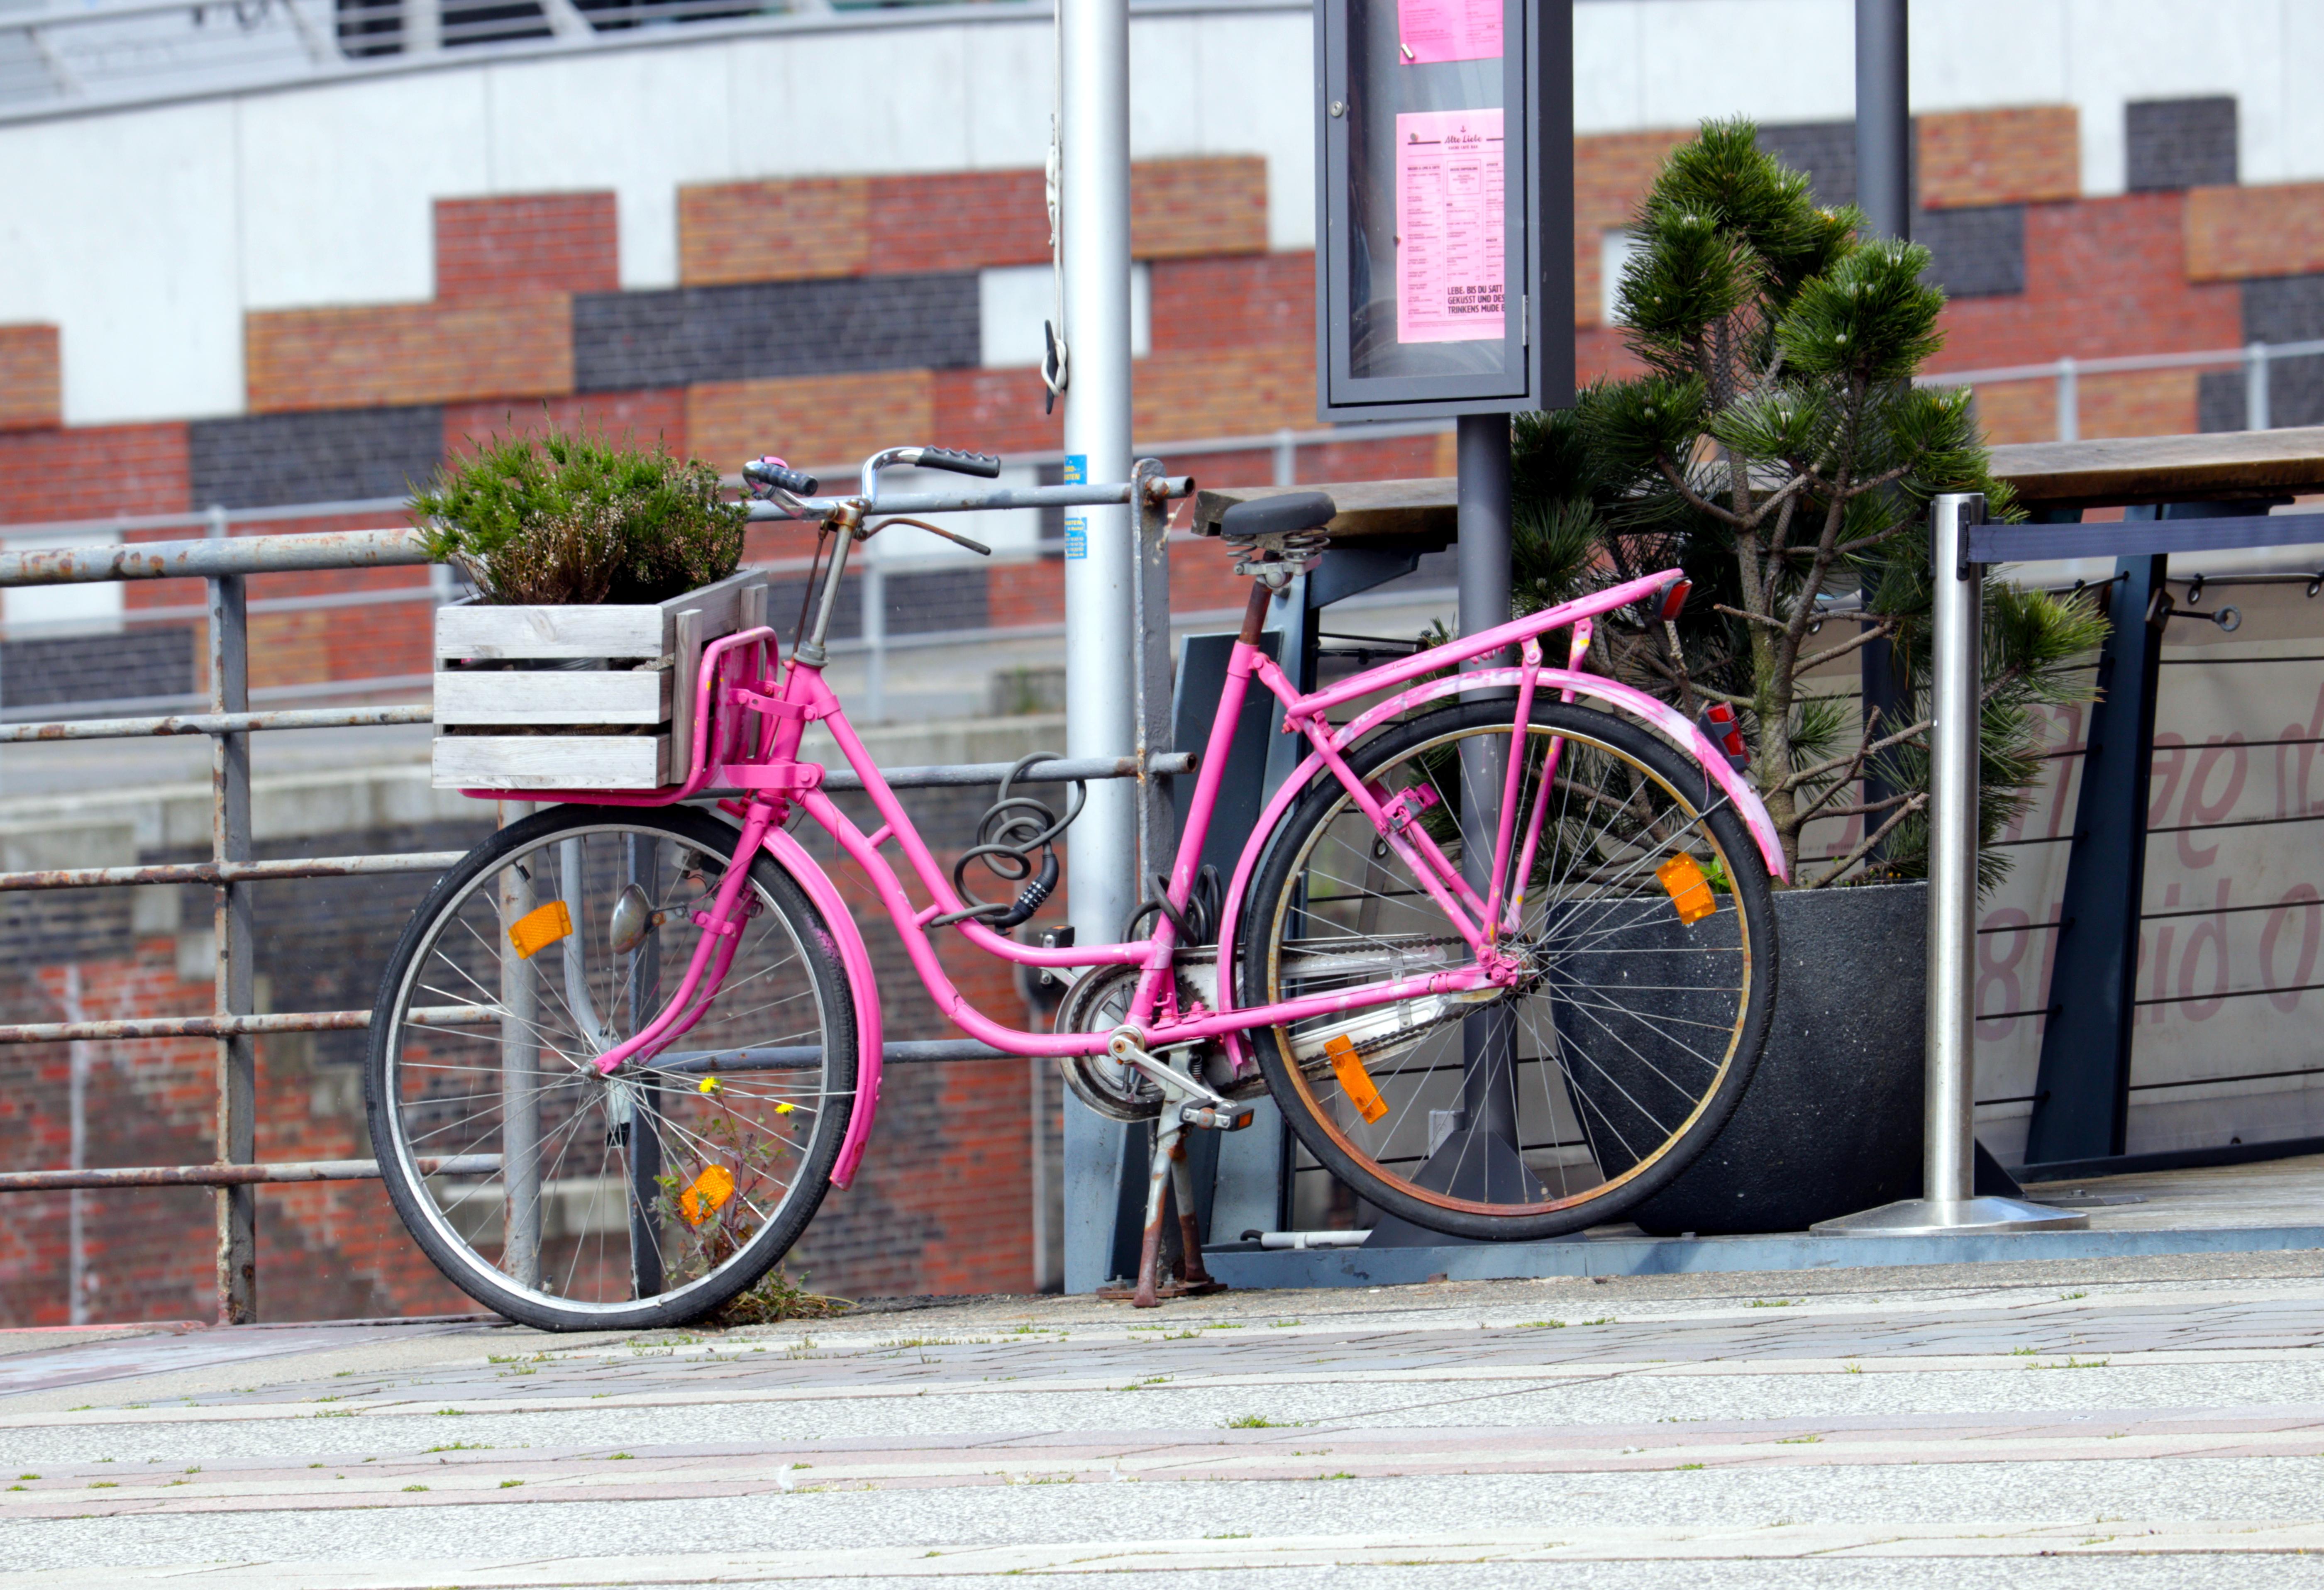 Pinkes Fahrrad